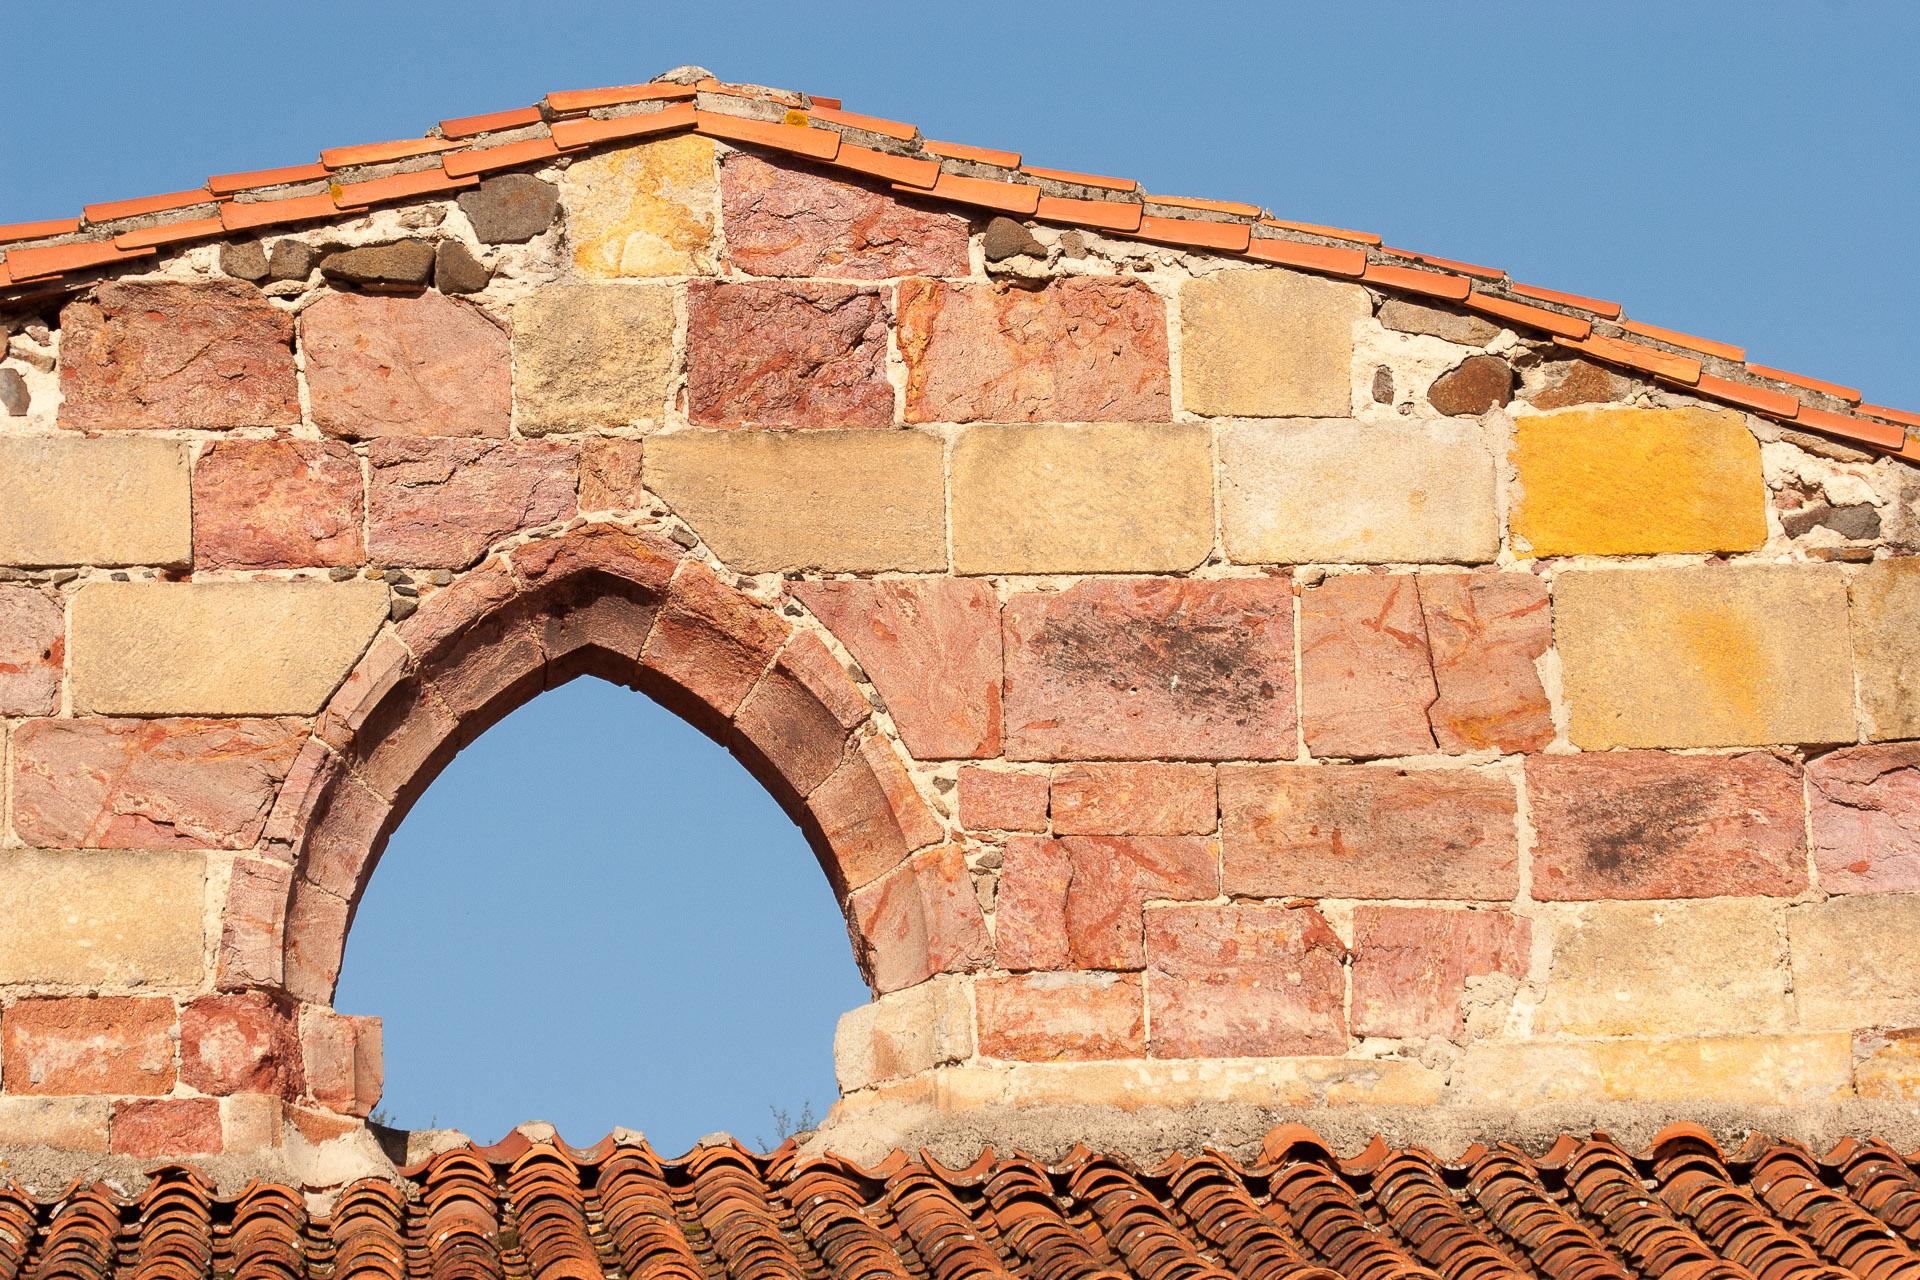 Manglieu église romane P.A.COUMES-0656